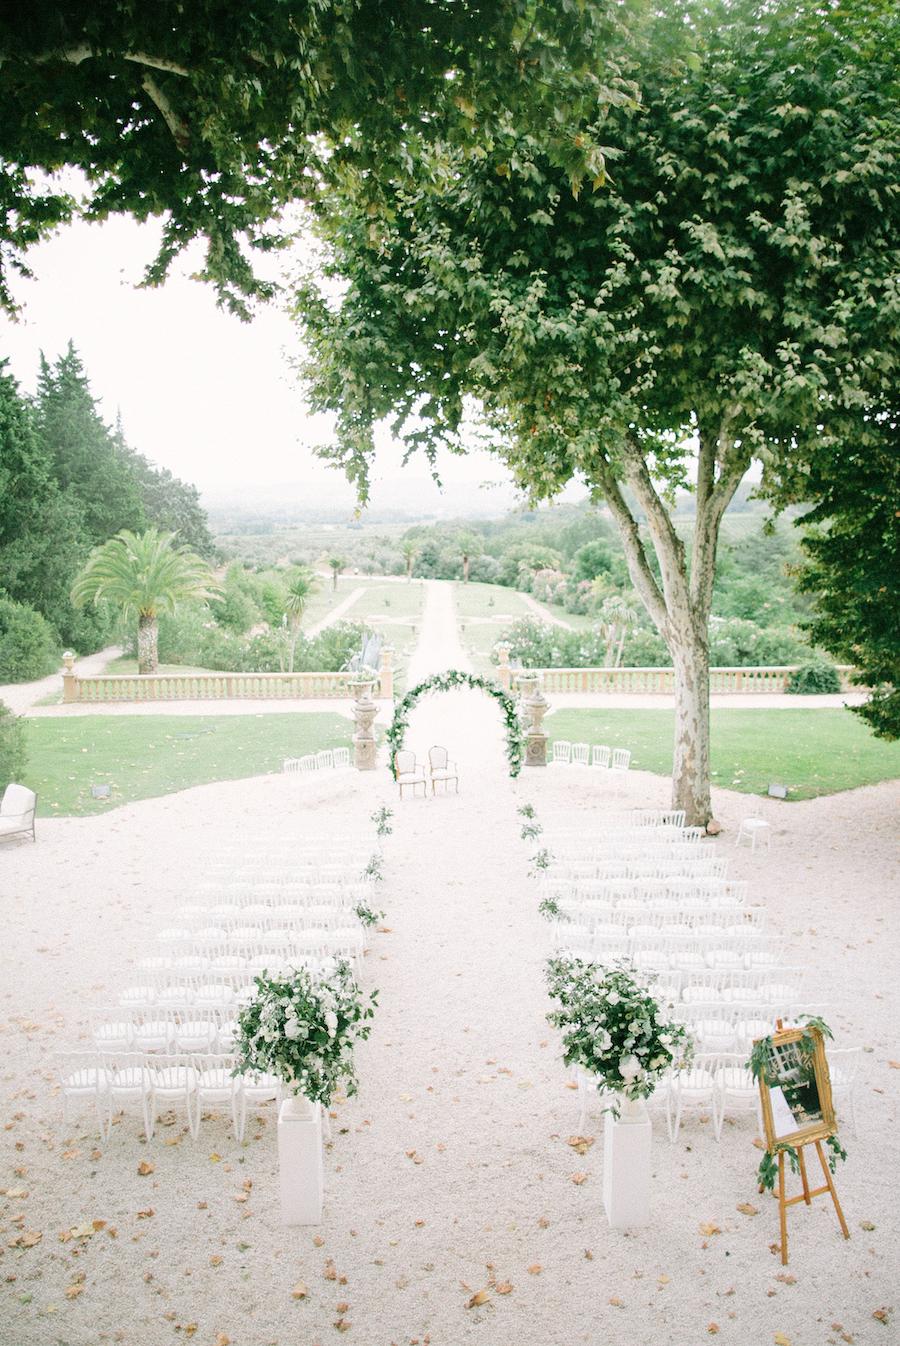 saya-photography-wedding-photographer-provence-chateau-de-robernier-41.jpg